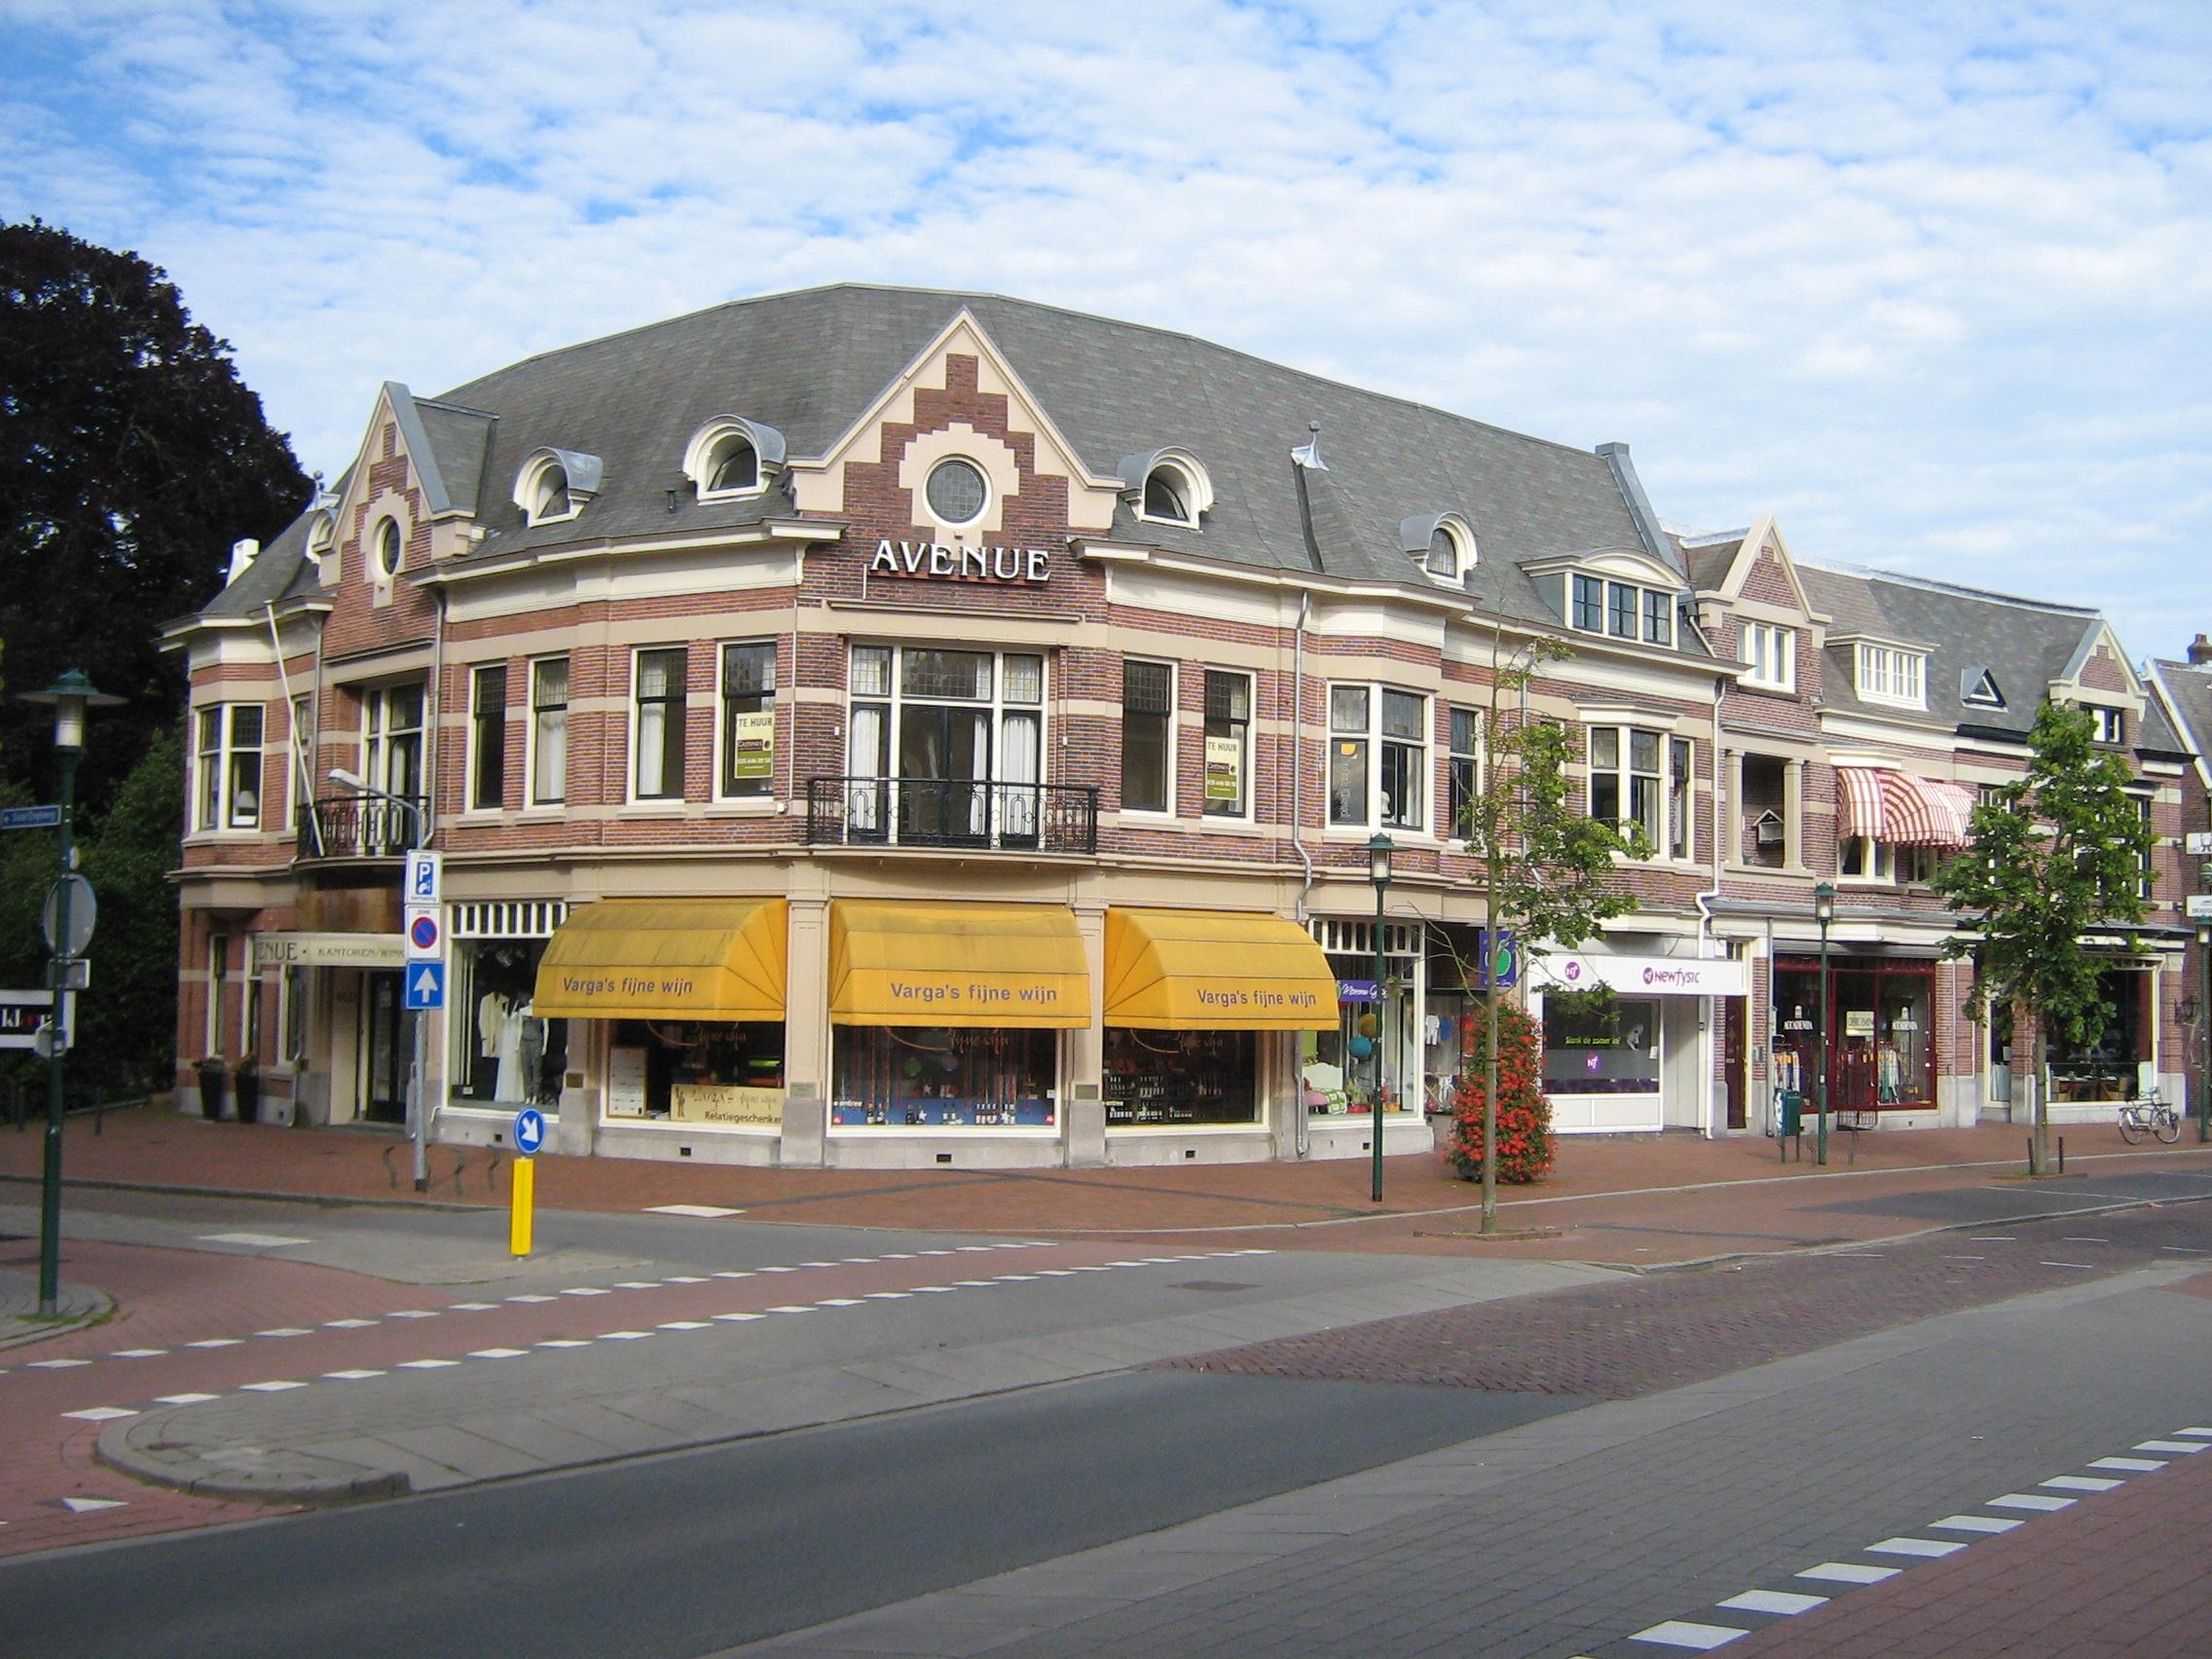 nl dating sites Hilversum